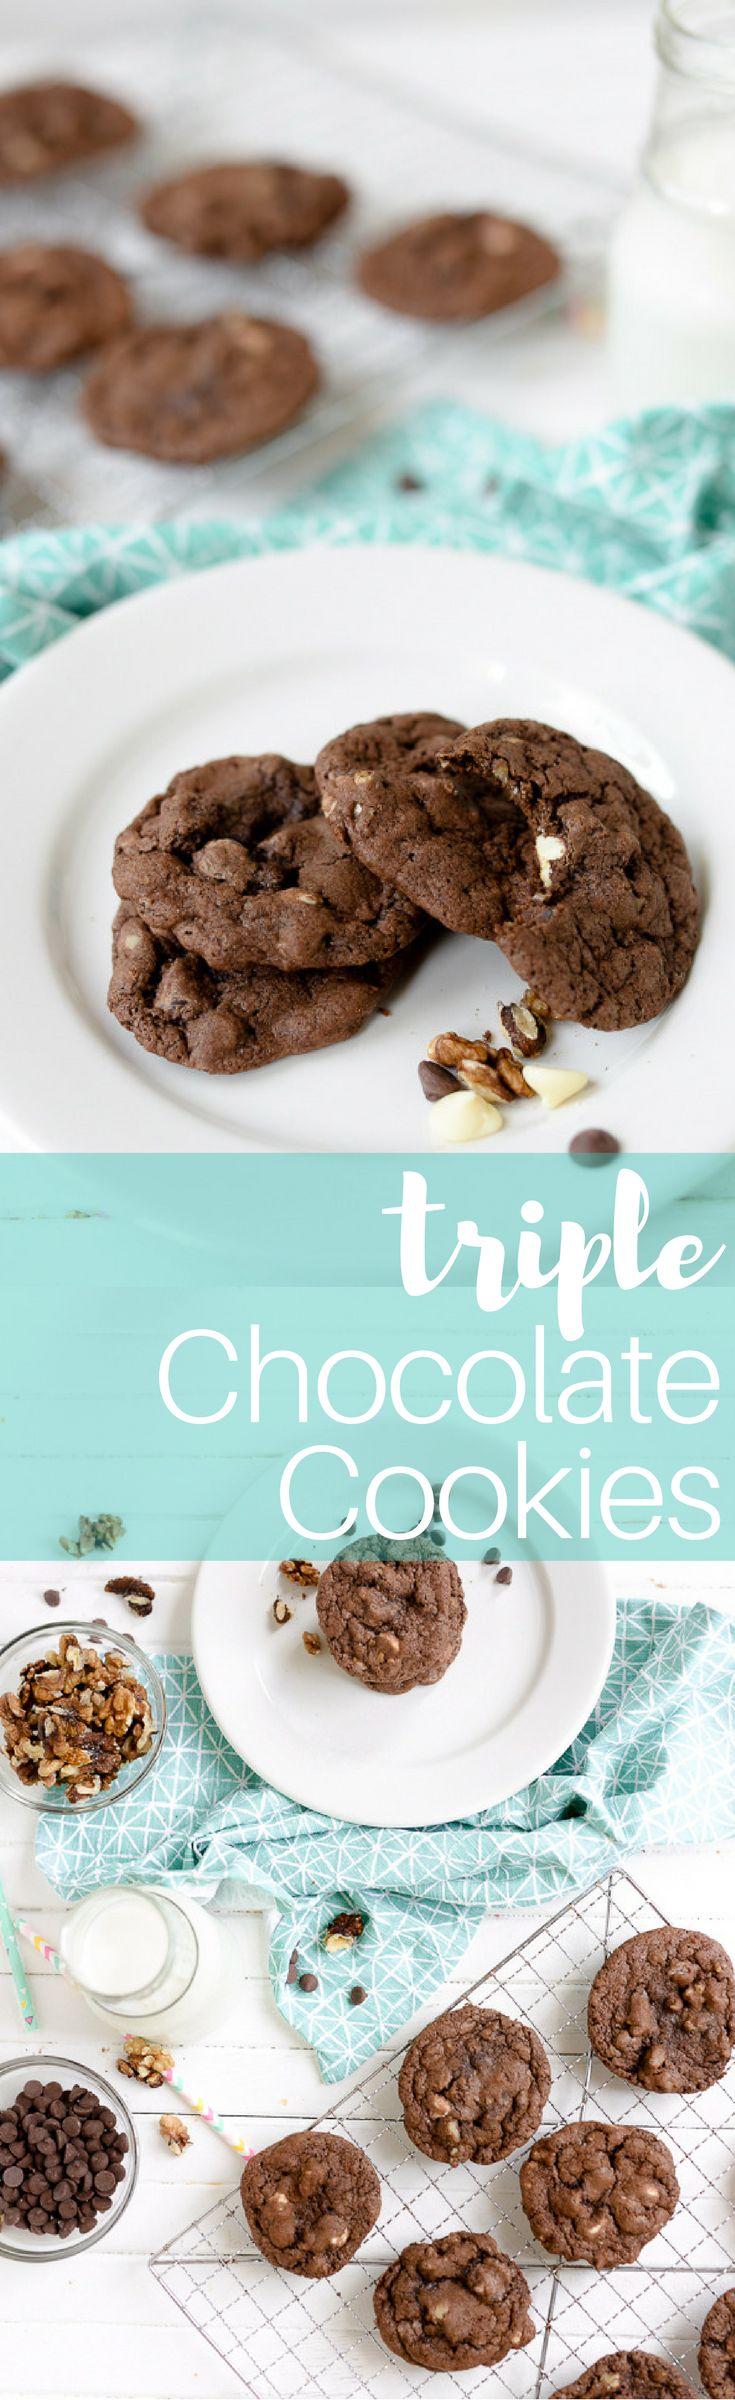 Panera Triple Chocolate Cookie Recipe